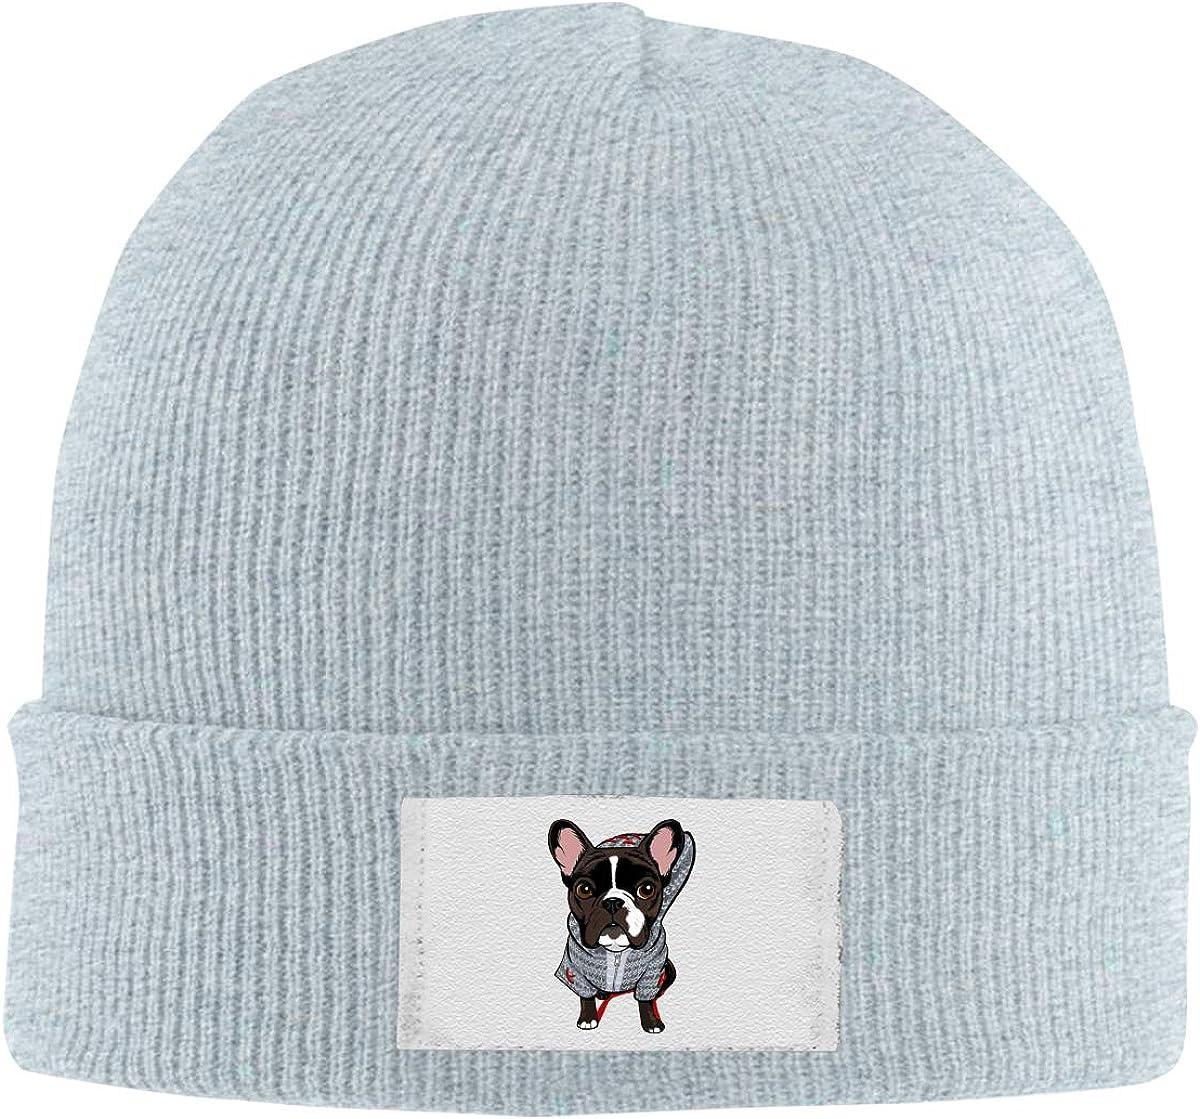 Stretchy Cuff Beanie Hat Black Dunpaiaa Skull Caps Cartoon Dog Winter Warm Knit Hats